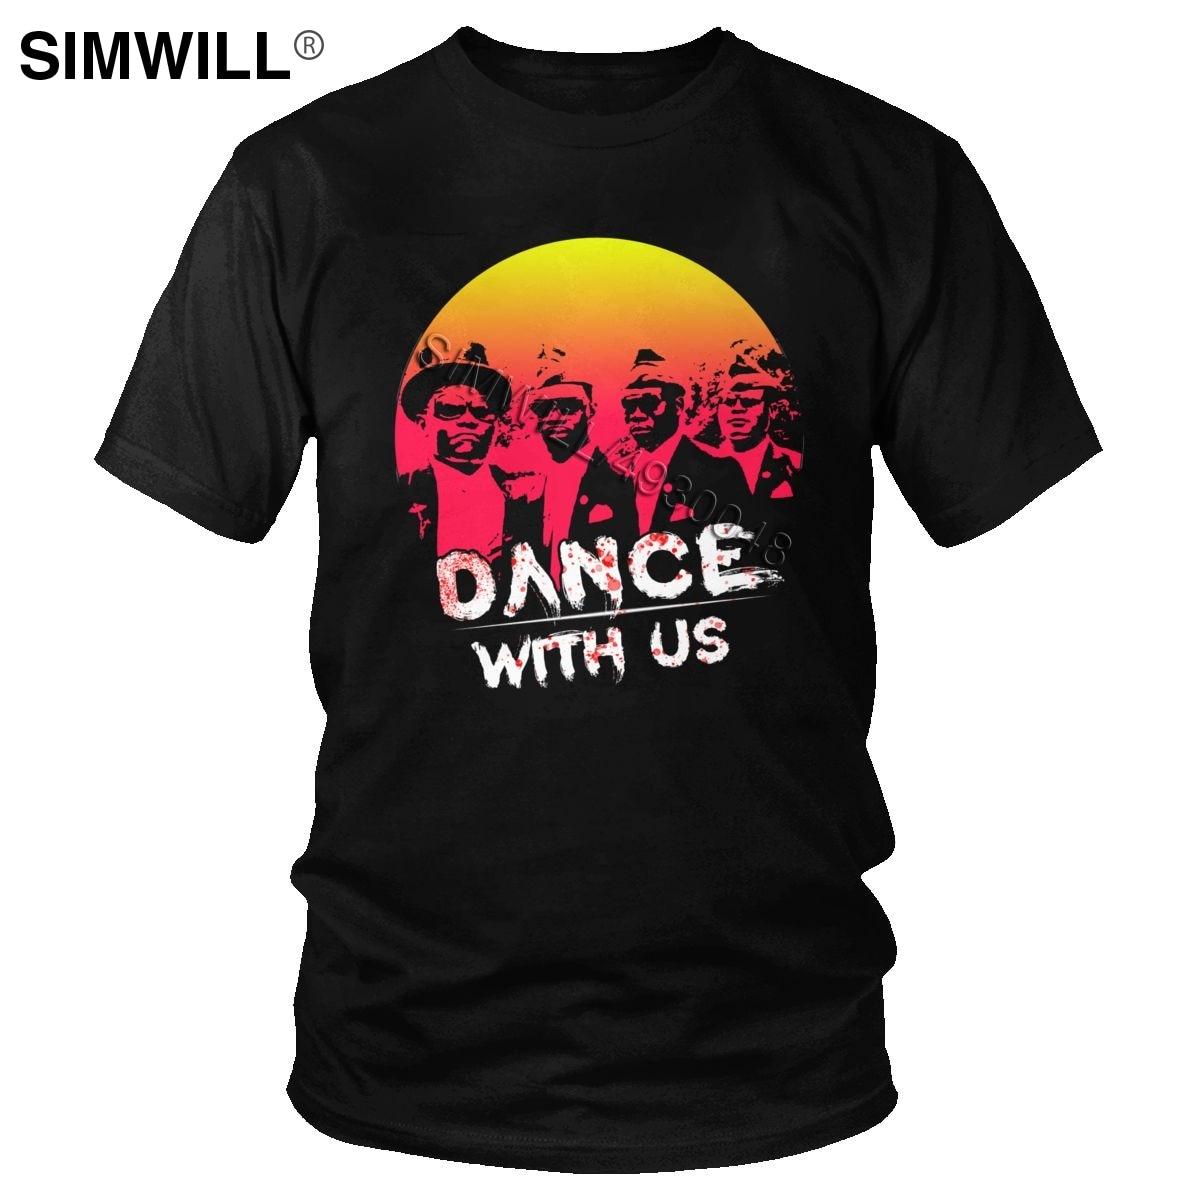 Humor Ghana ataúd Dance camiseta hombres 2020 divertido Meme Funeral Dancing con Casket Pallbearers Camiseta de manga corta de algodón Tee Top